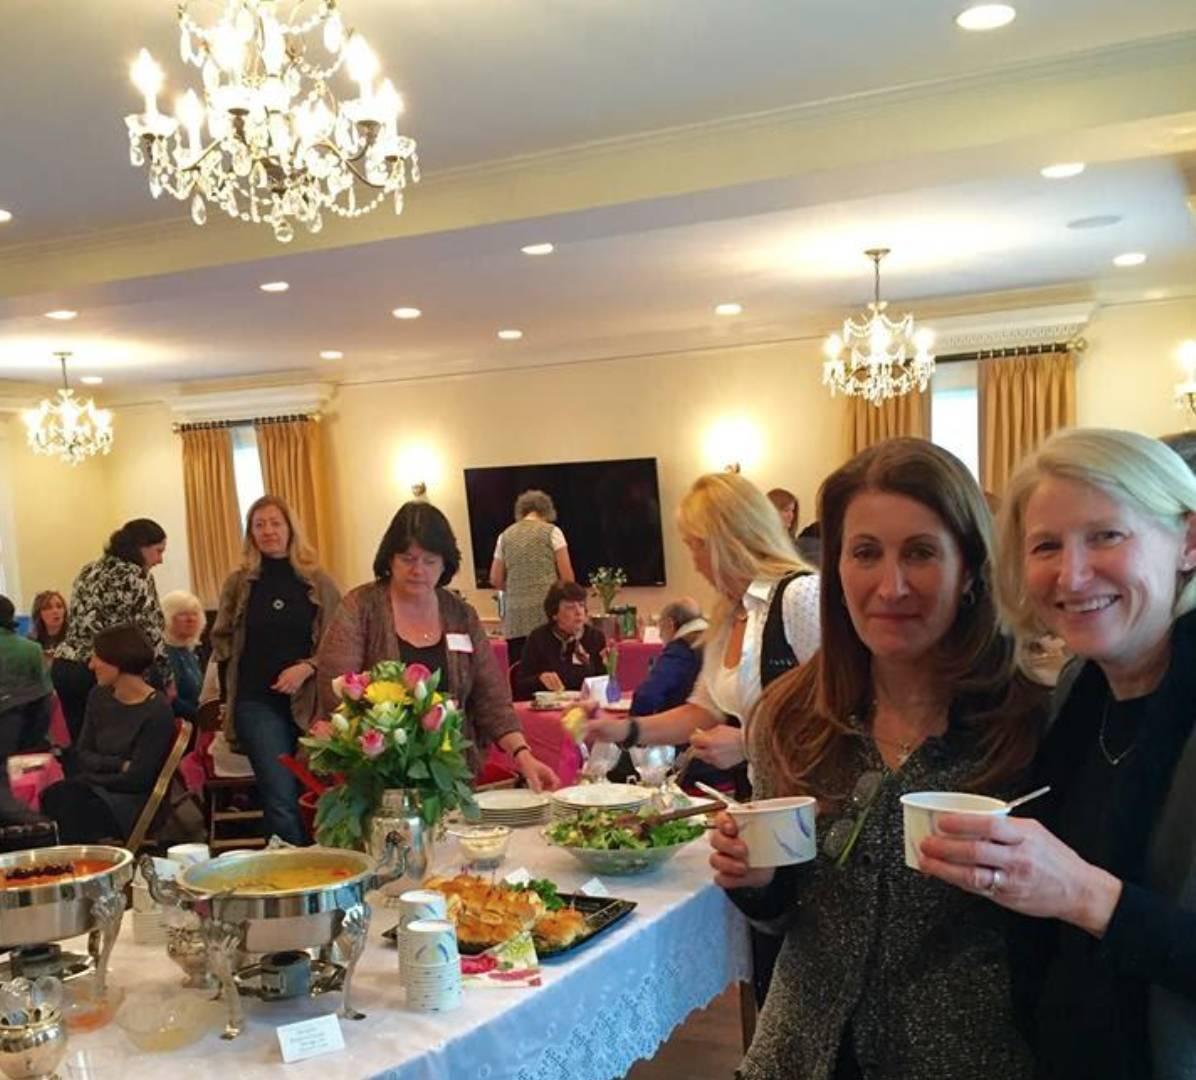 Summit's Area Baby Center Hosts 'Mid-Winter Respite' Feb